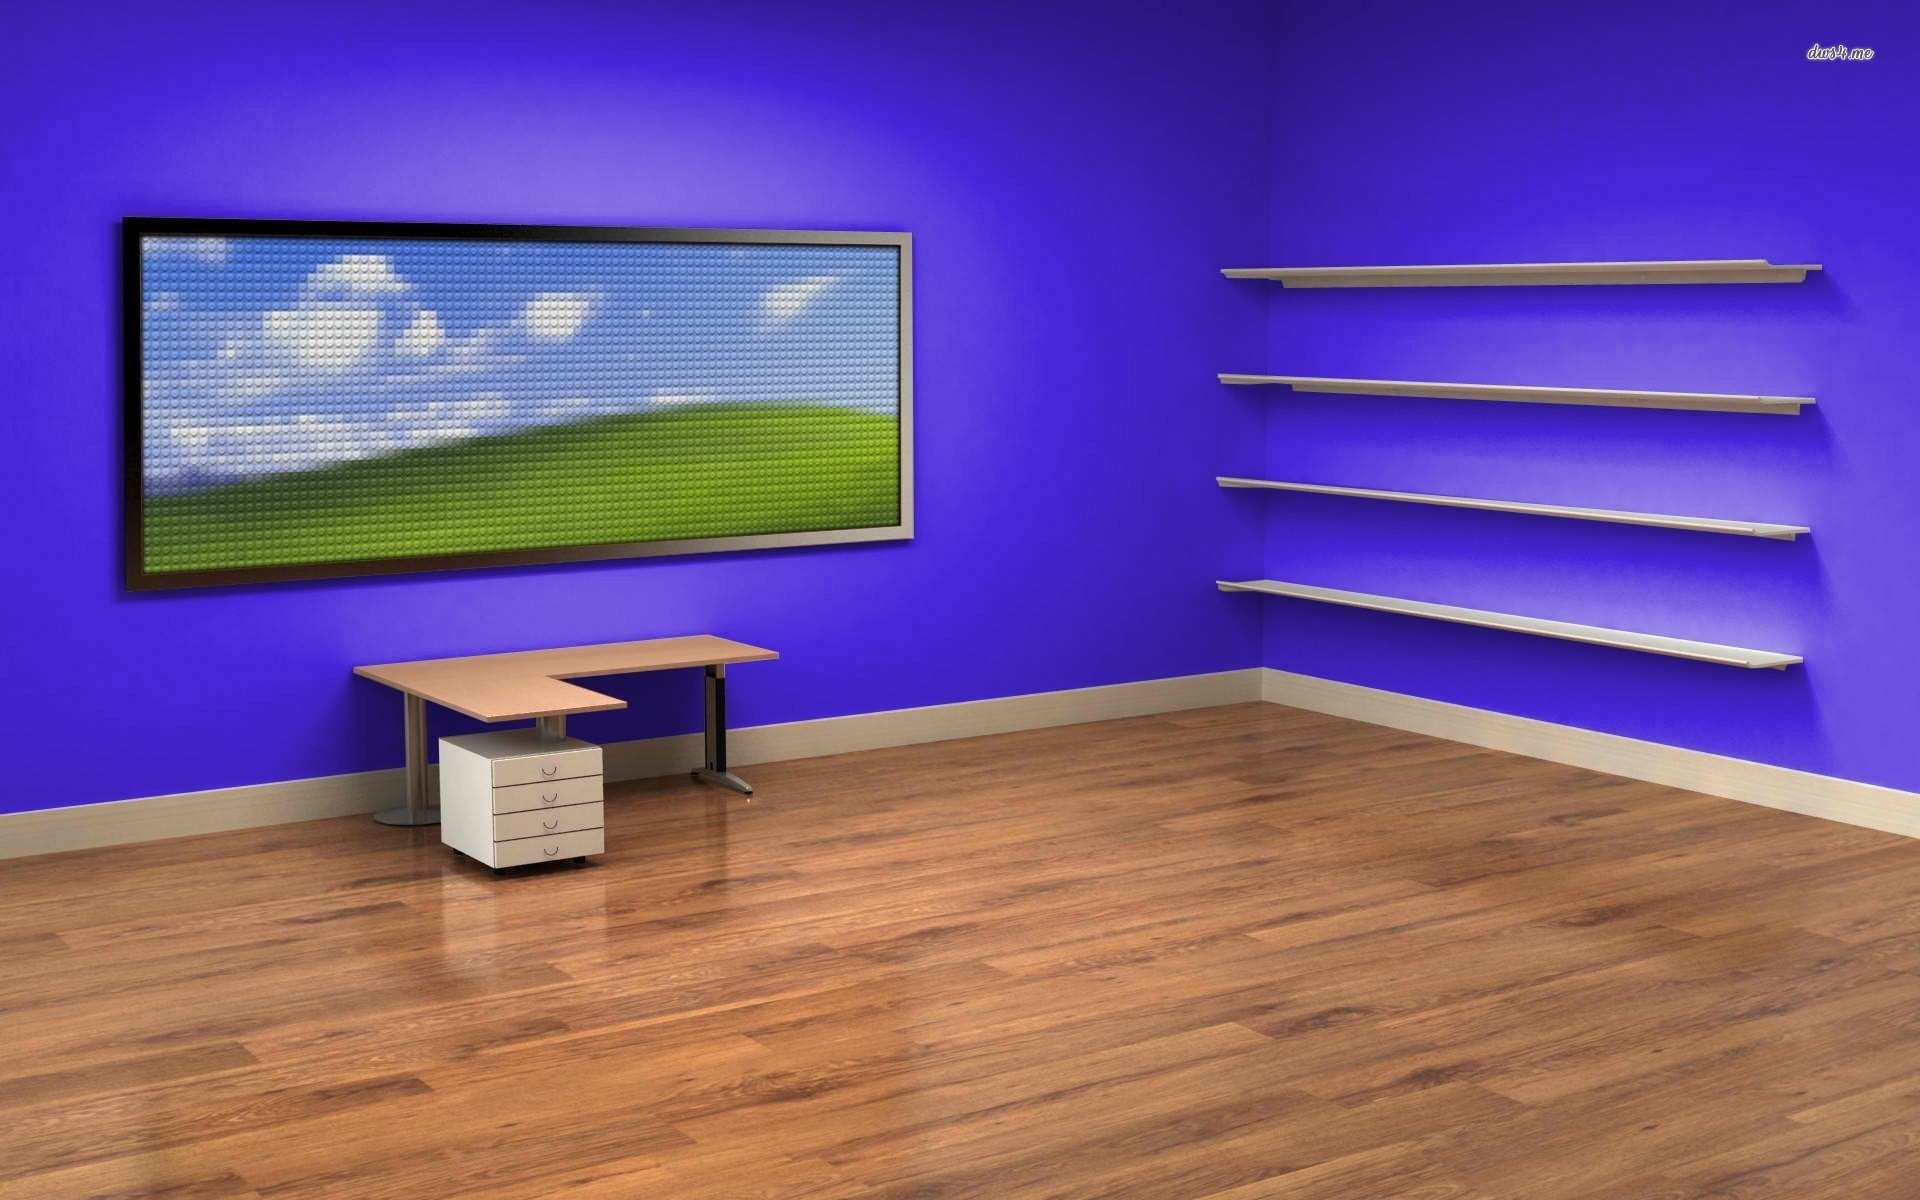 Office Desktop Background 183 ①